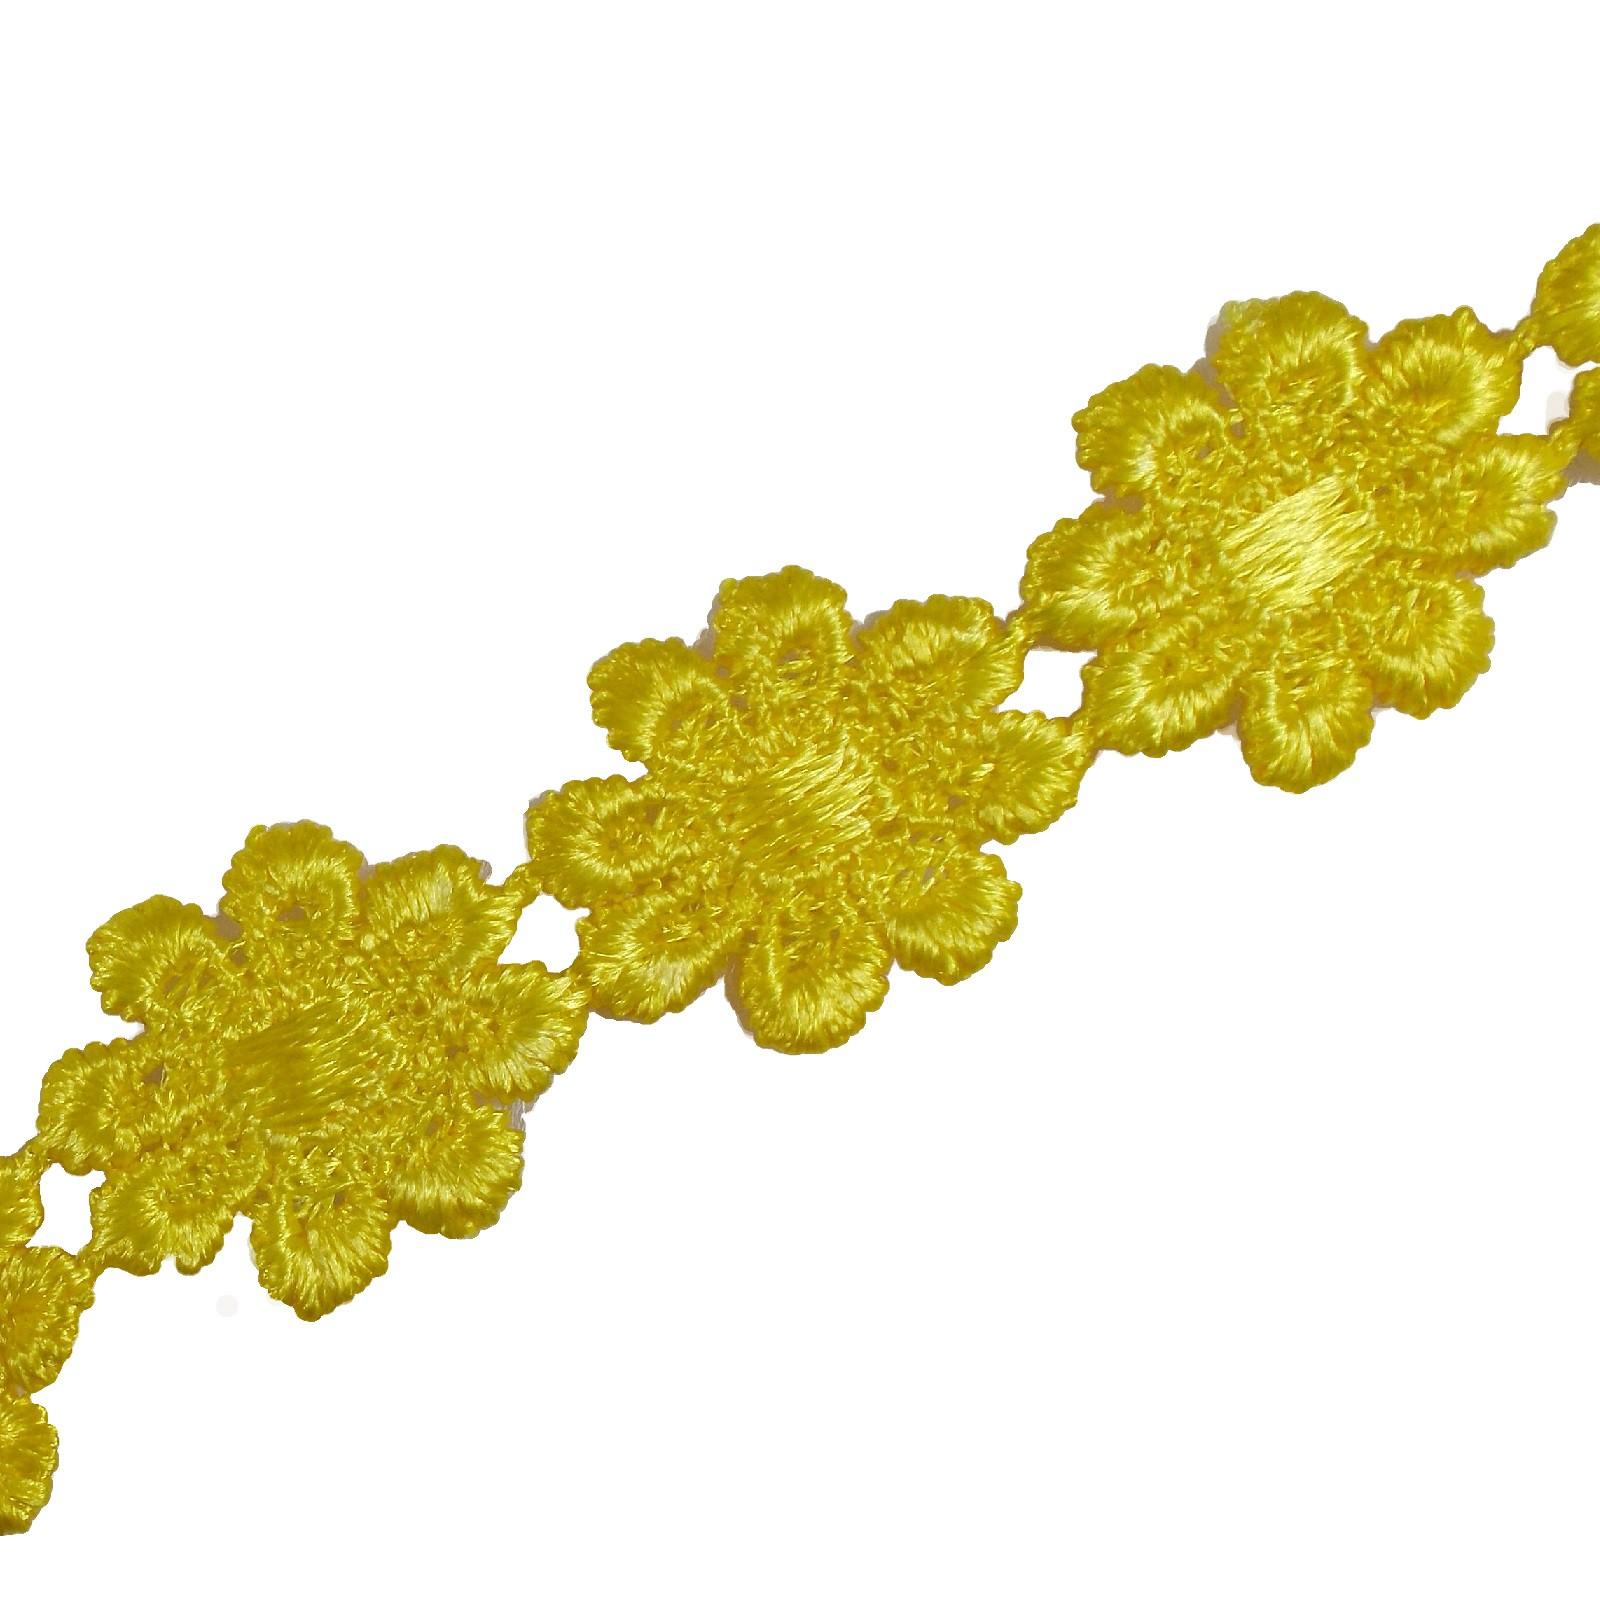 Guipure Daisy Flowers Lace Trim Applique 25mm Yellow 1 metre length